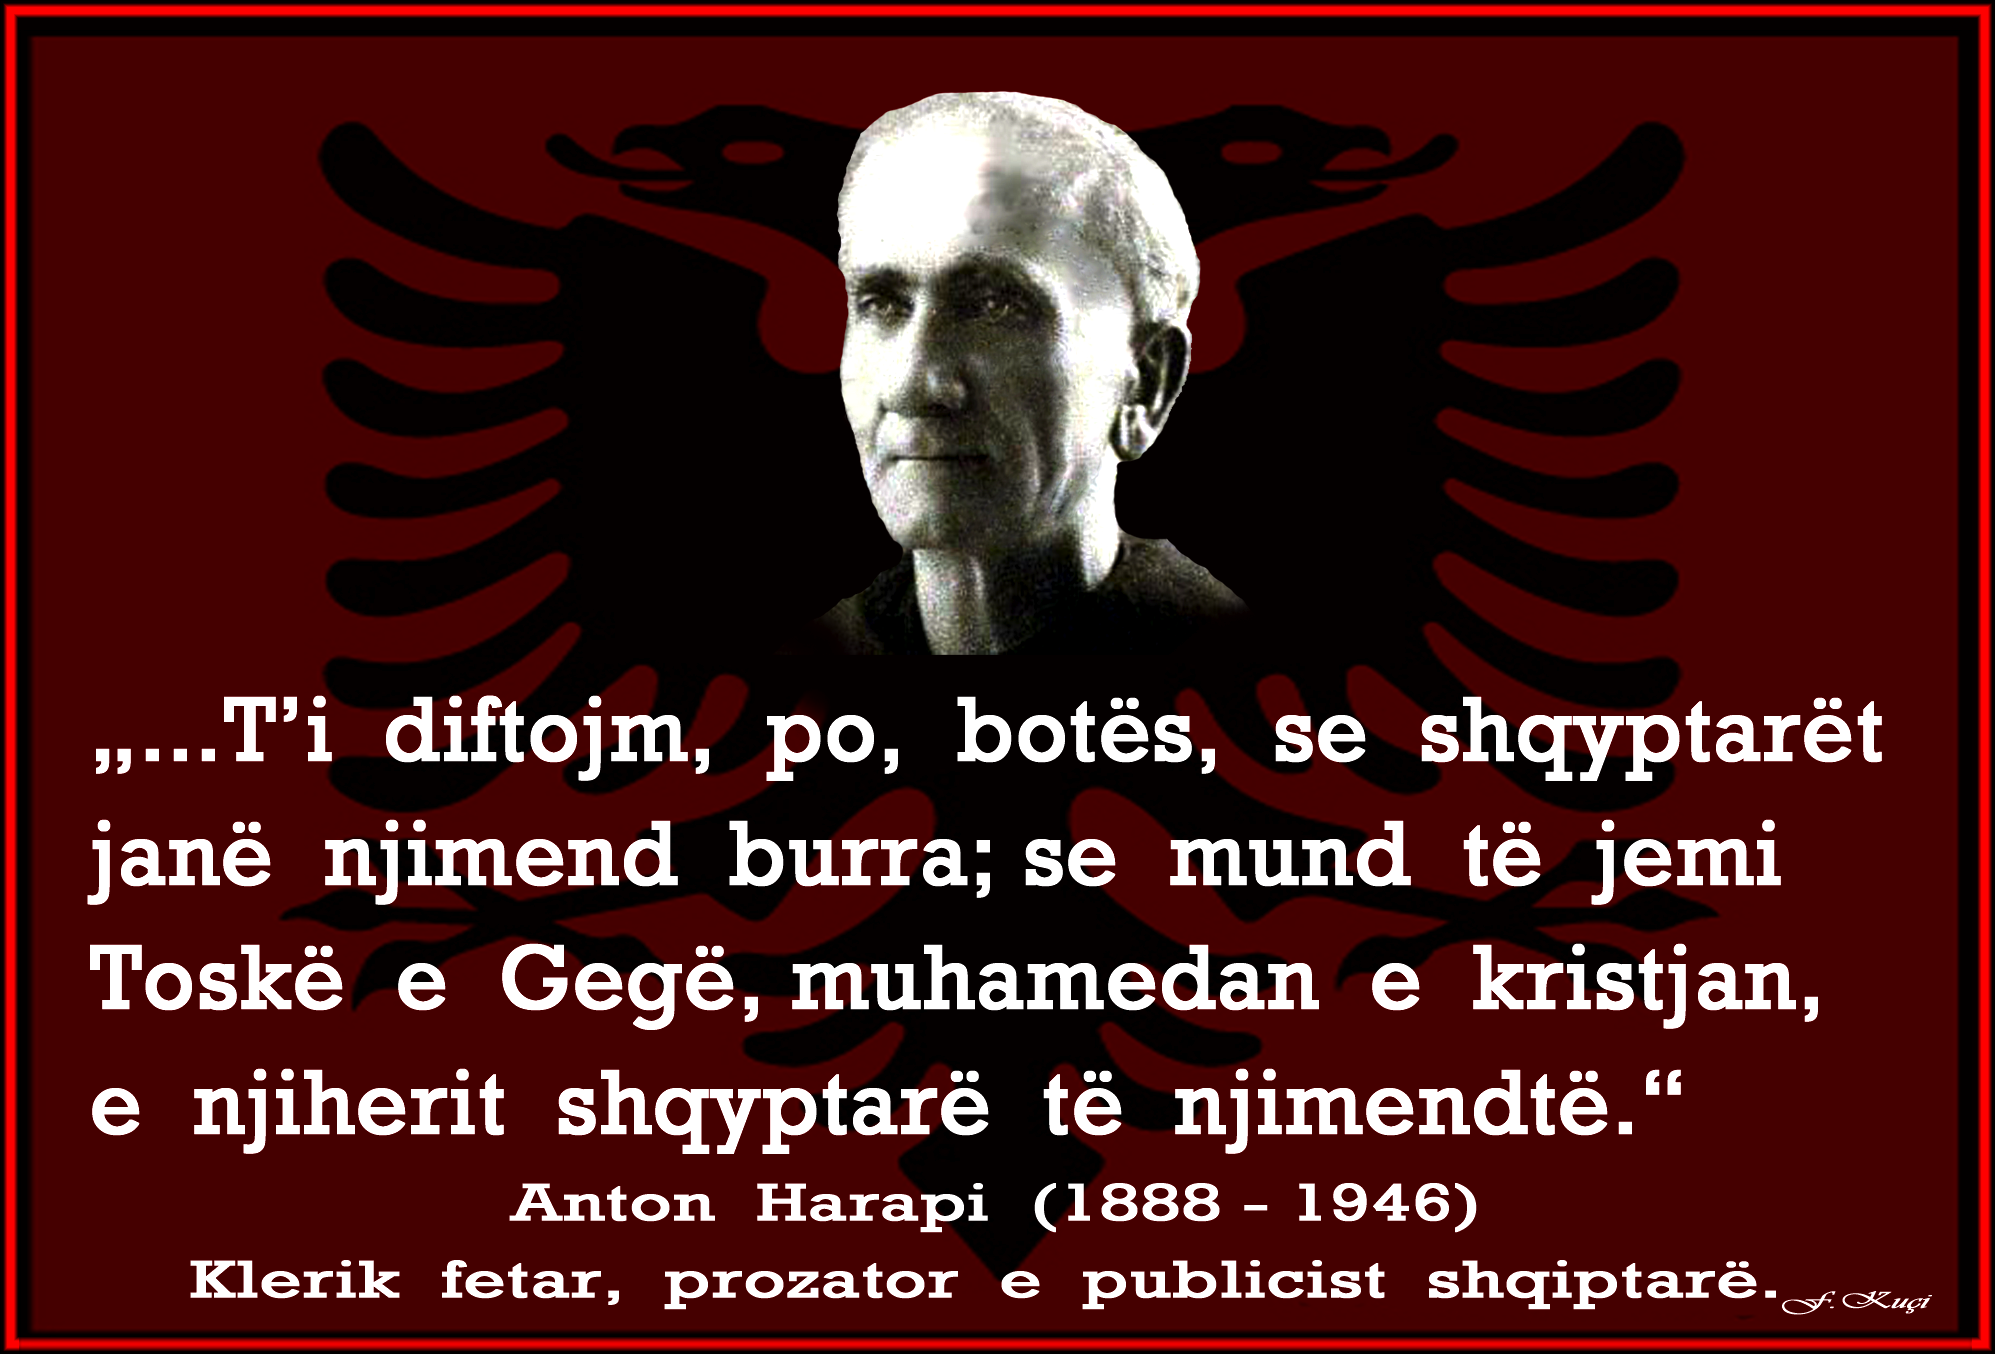 Anton Harapi - Atdhetarizmi